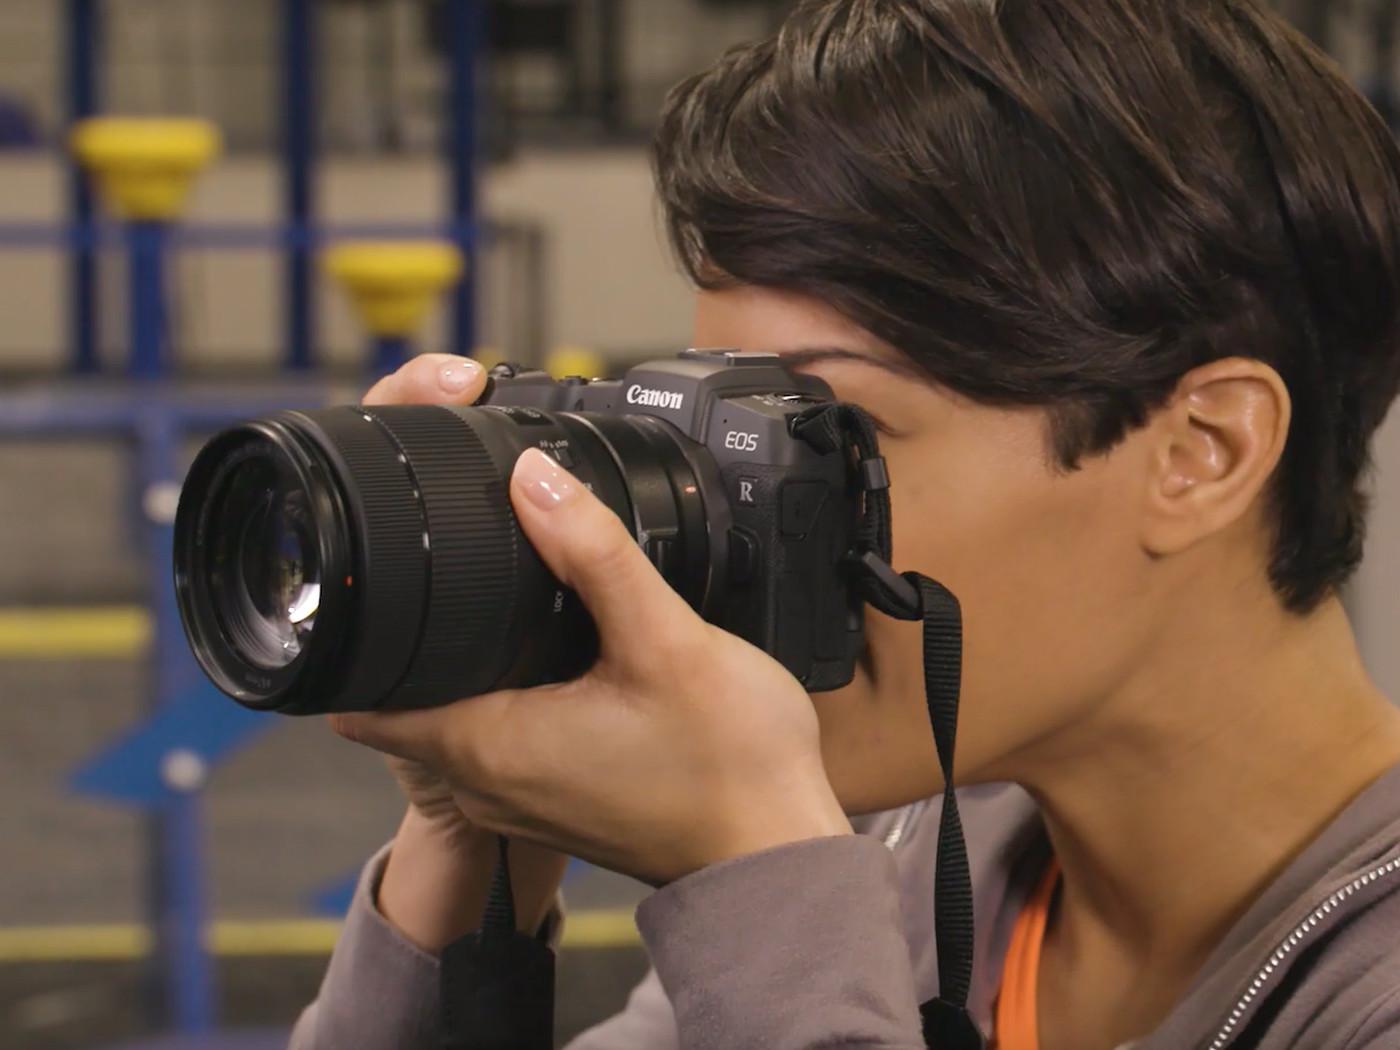 Canon announces EOS RP full-frame mirrorless camera at